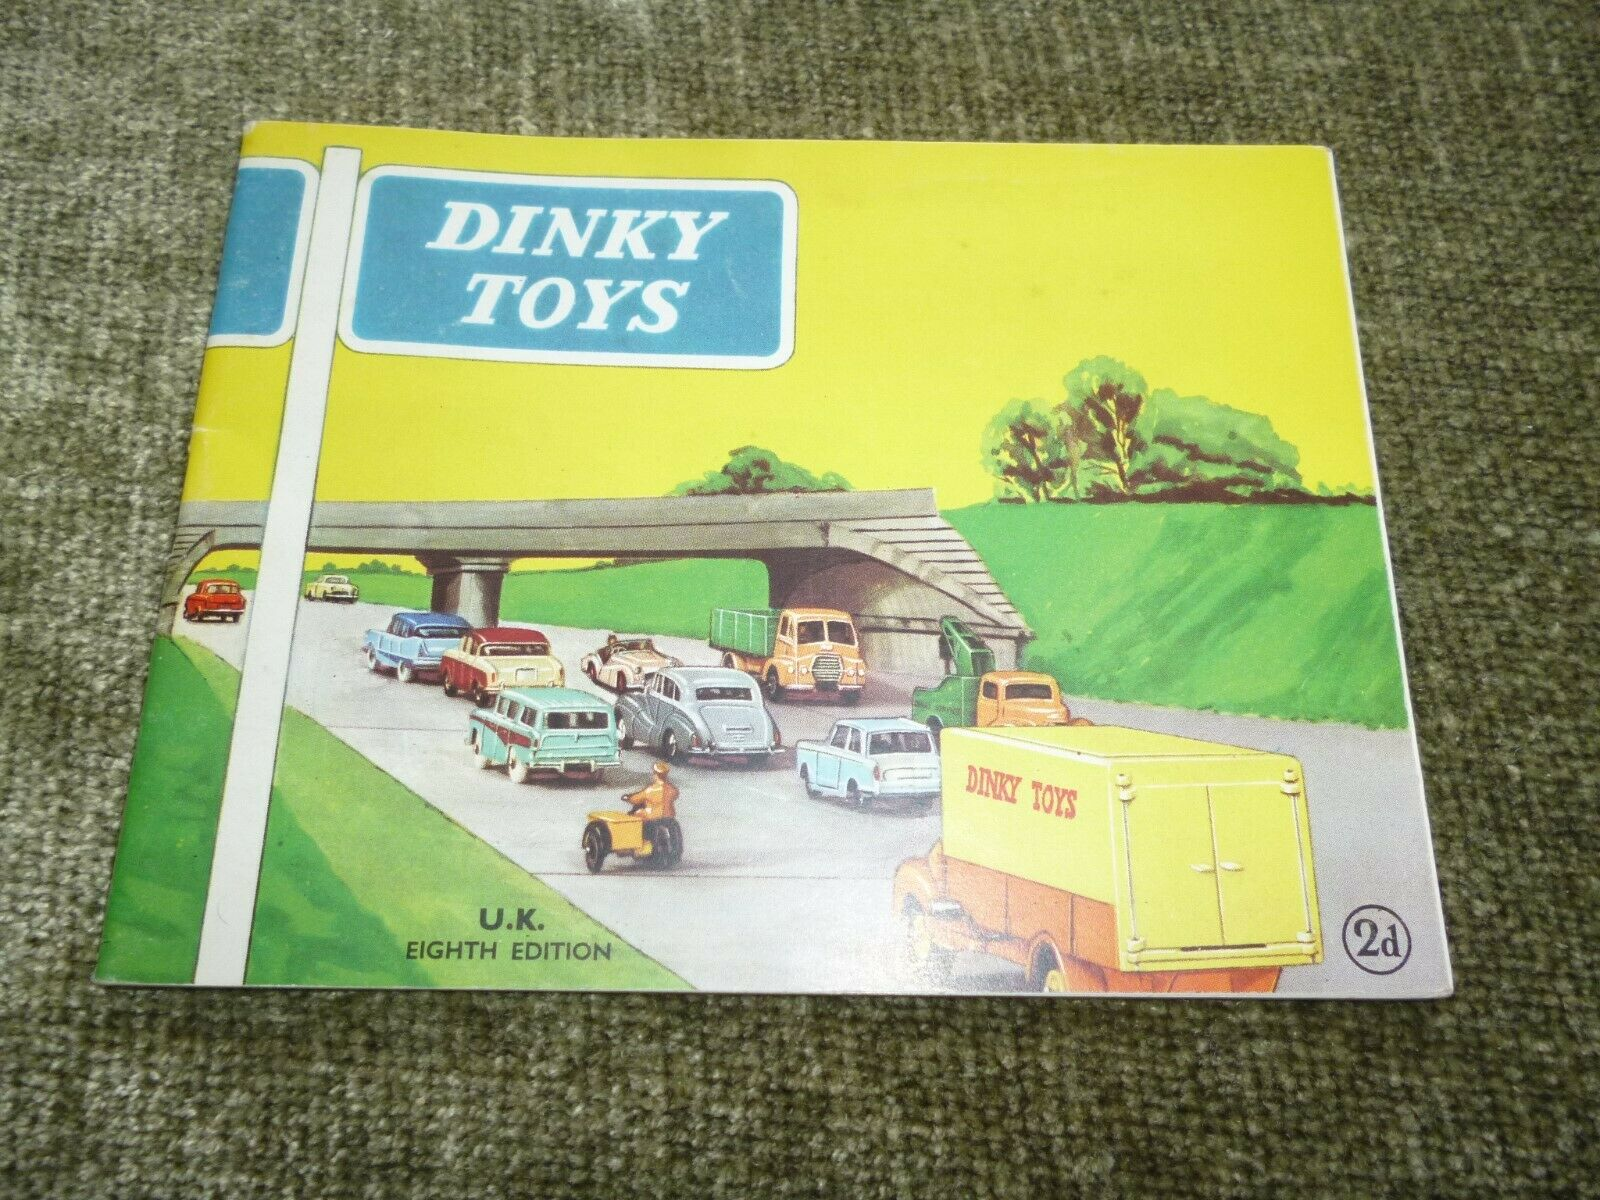 Genuine Dinky Toys Diecast Car Supertoys Catalogue 8th Edition Adgreenising 1960